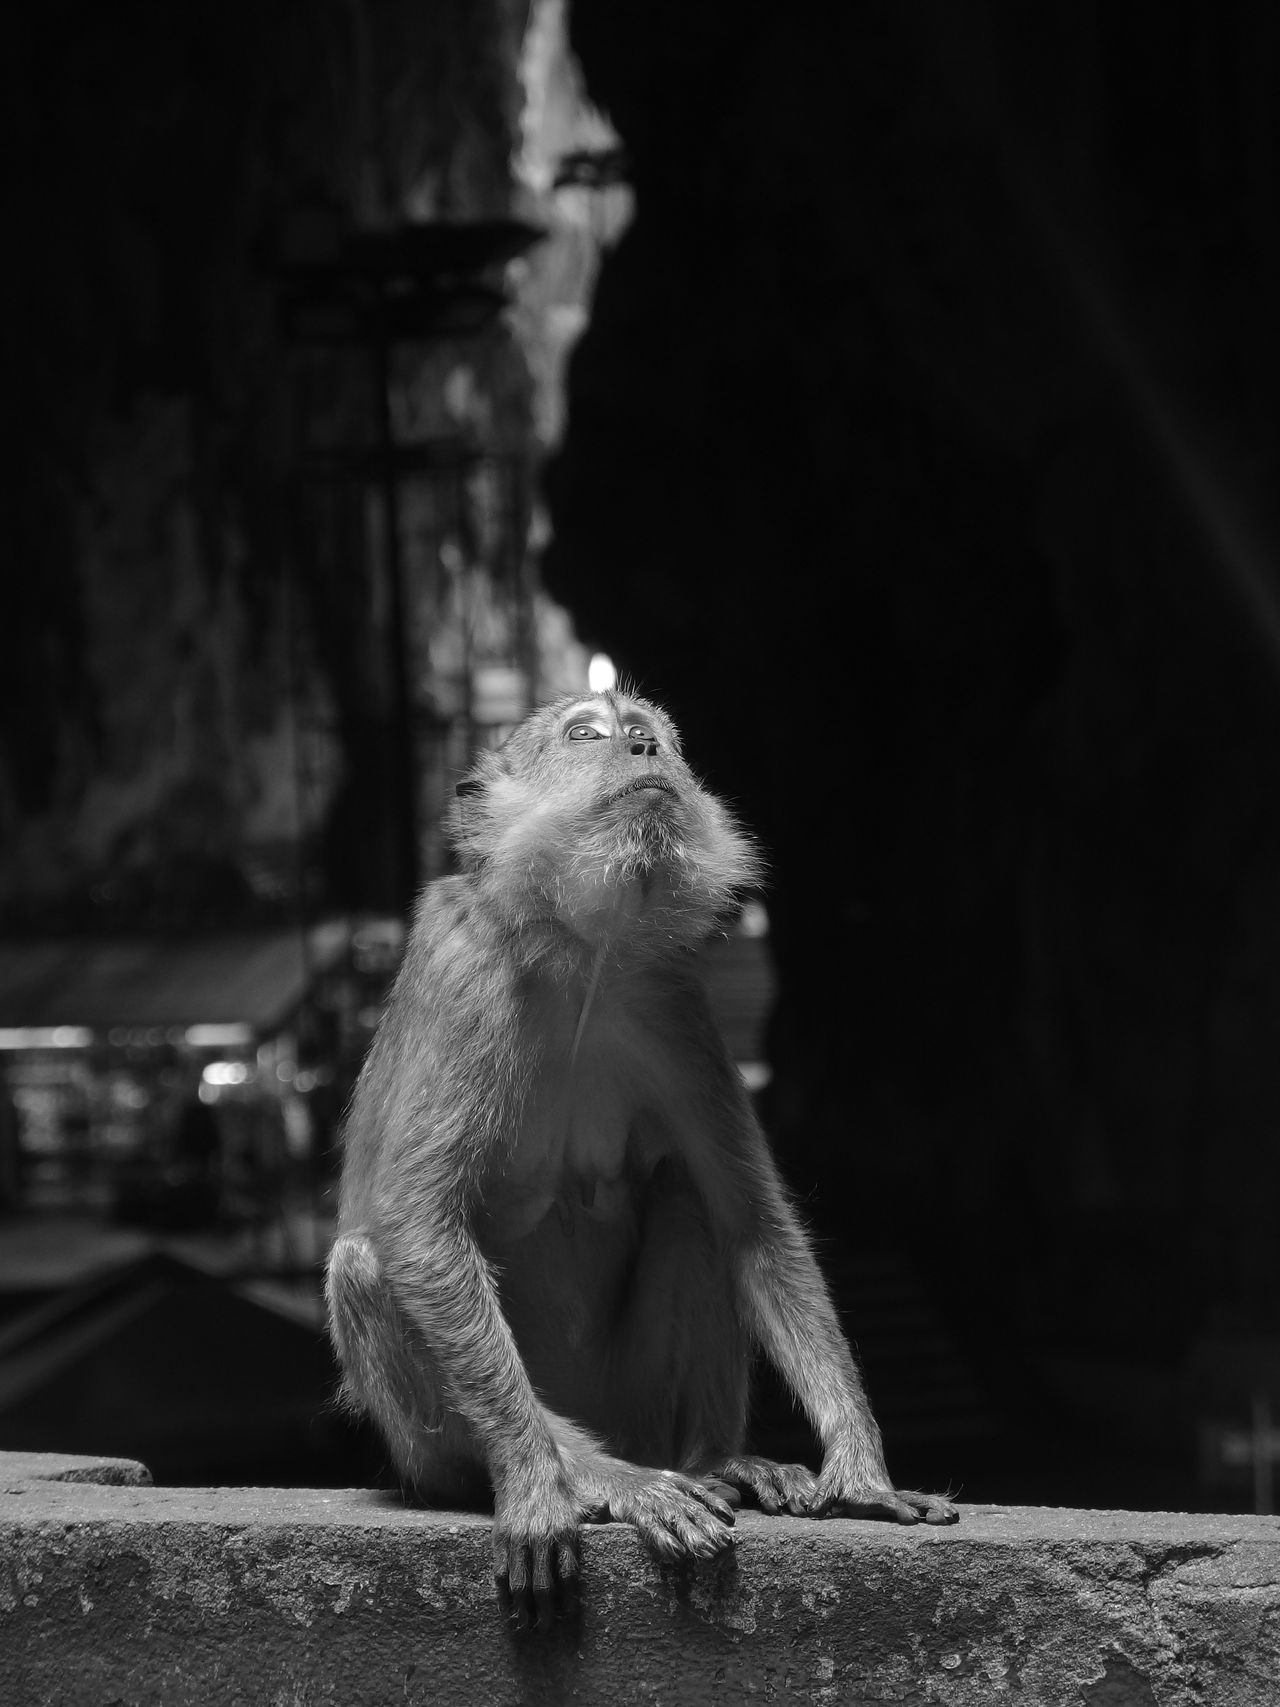 Animal Themes Batu Caves Batu Caves -Malaysia Blackandwhite Cave Caves Curiosity Monkey Nature One Animal Rock